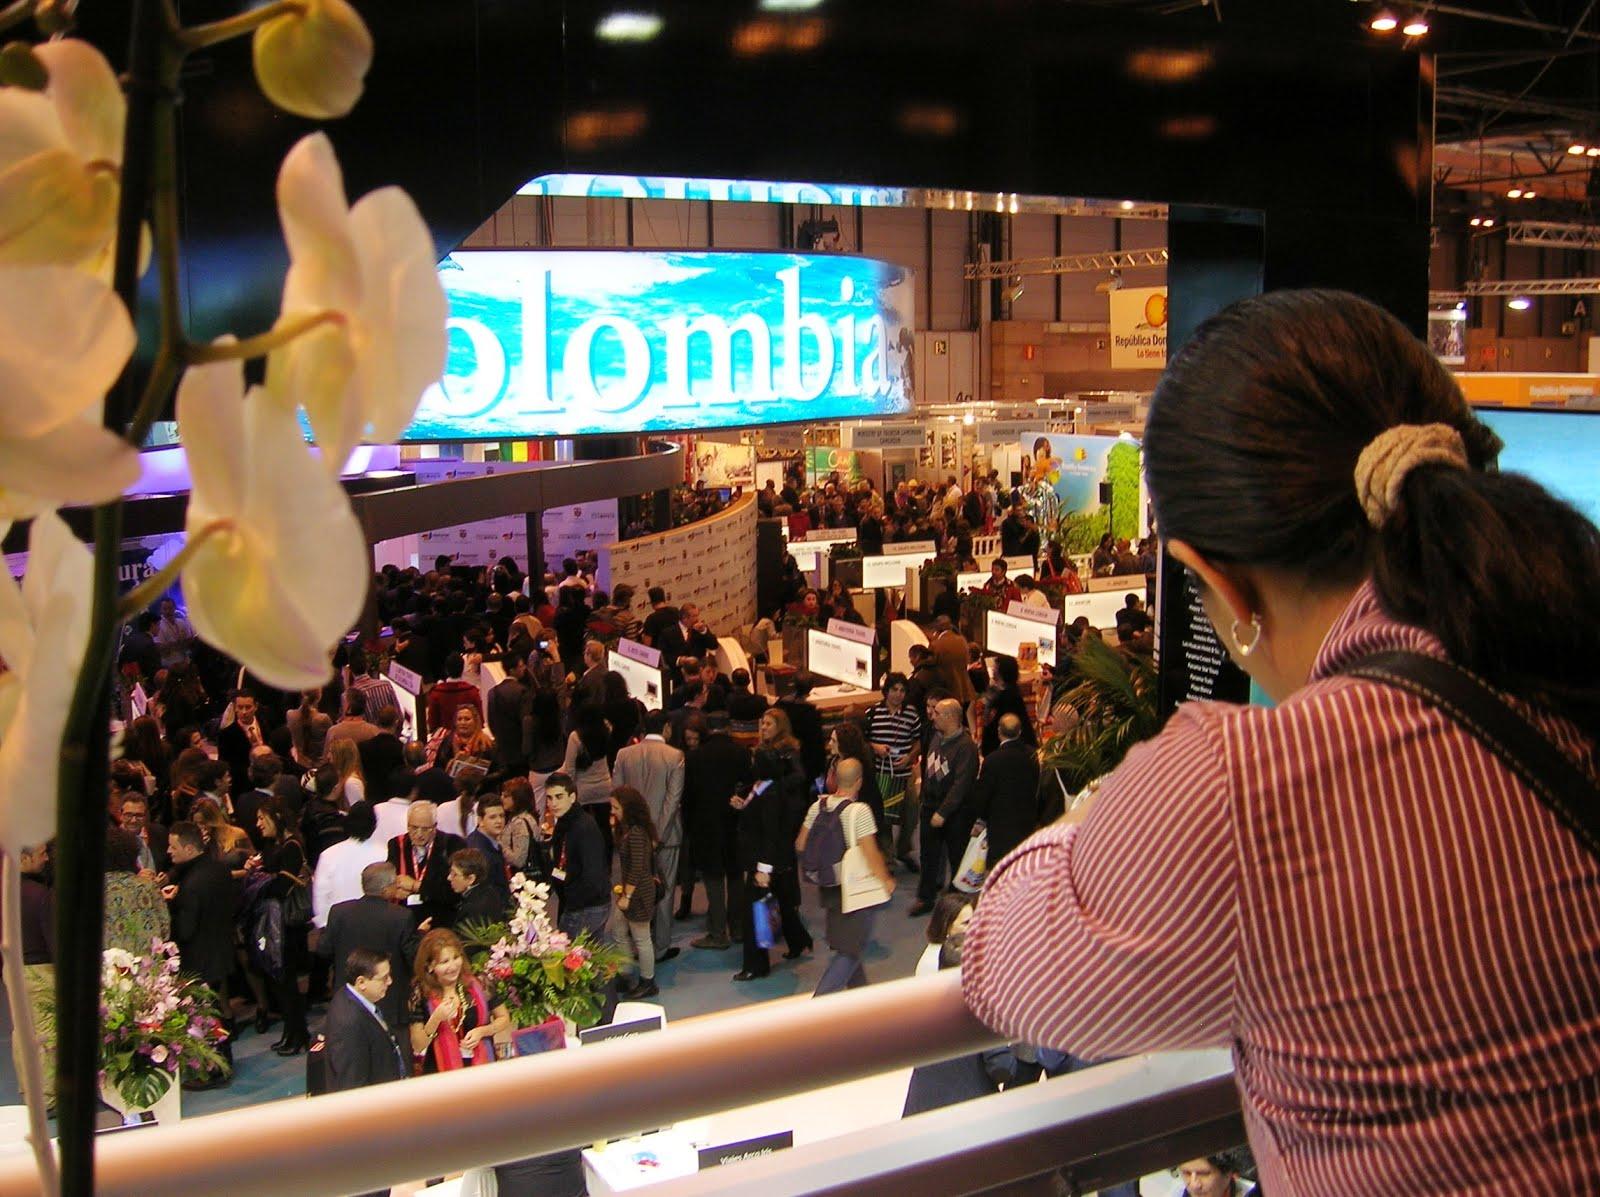 Fitur, Feria de Madrid, vuelta al mundo, round the world, La vuelta al mundo de Asun y Ricardo